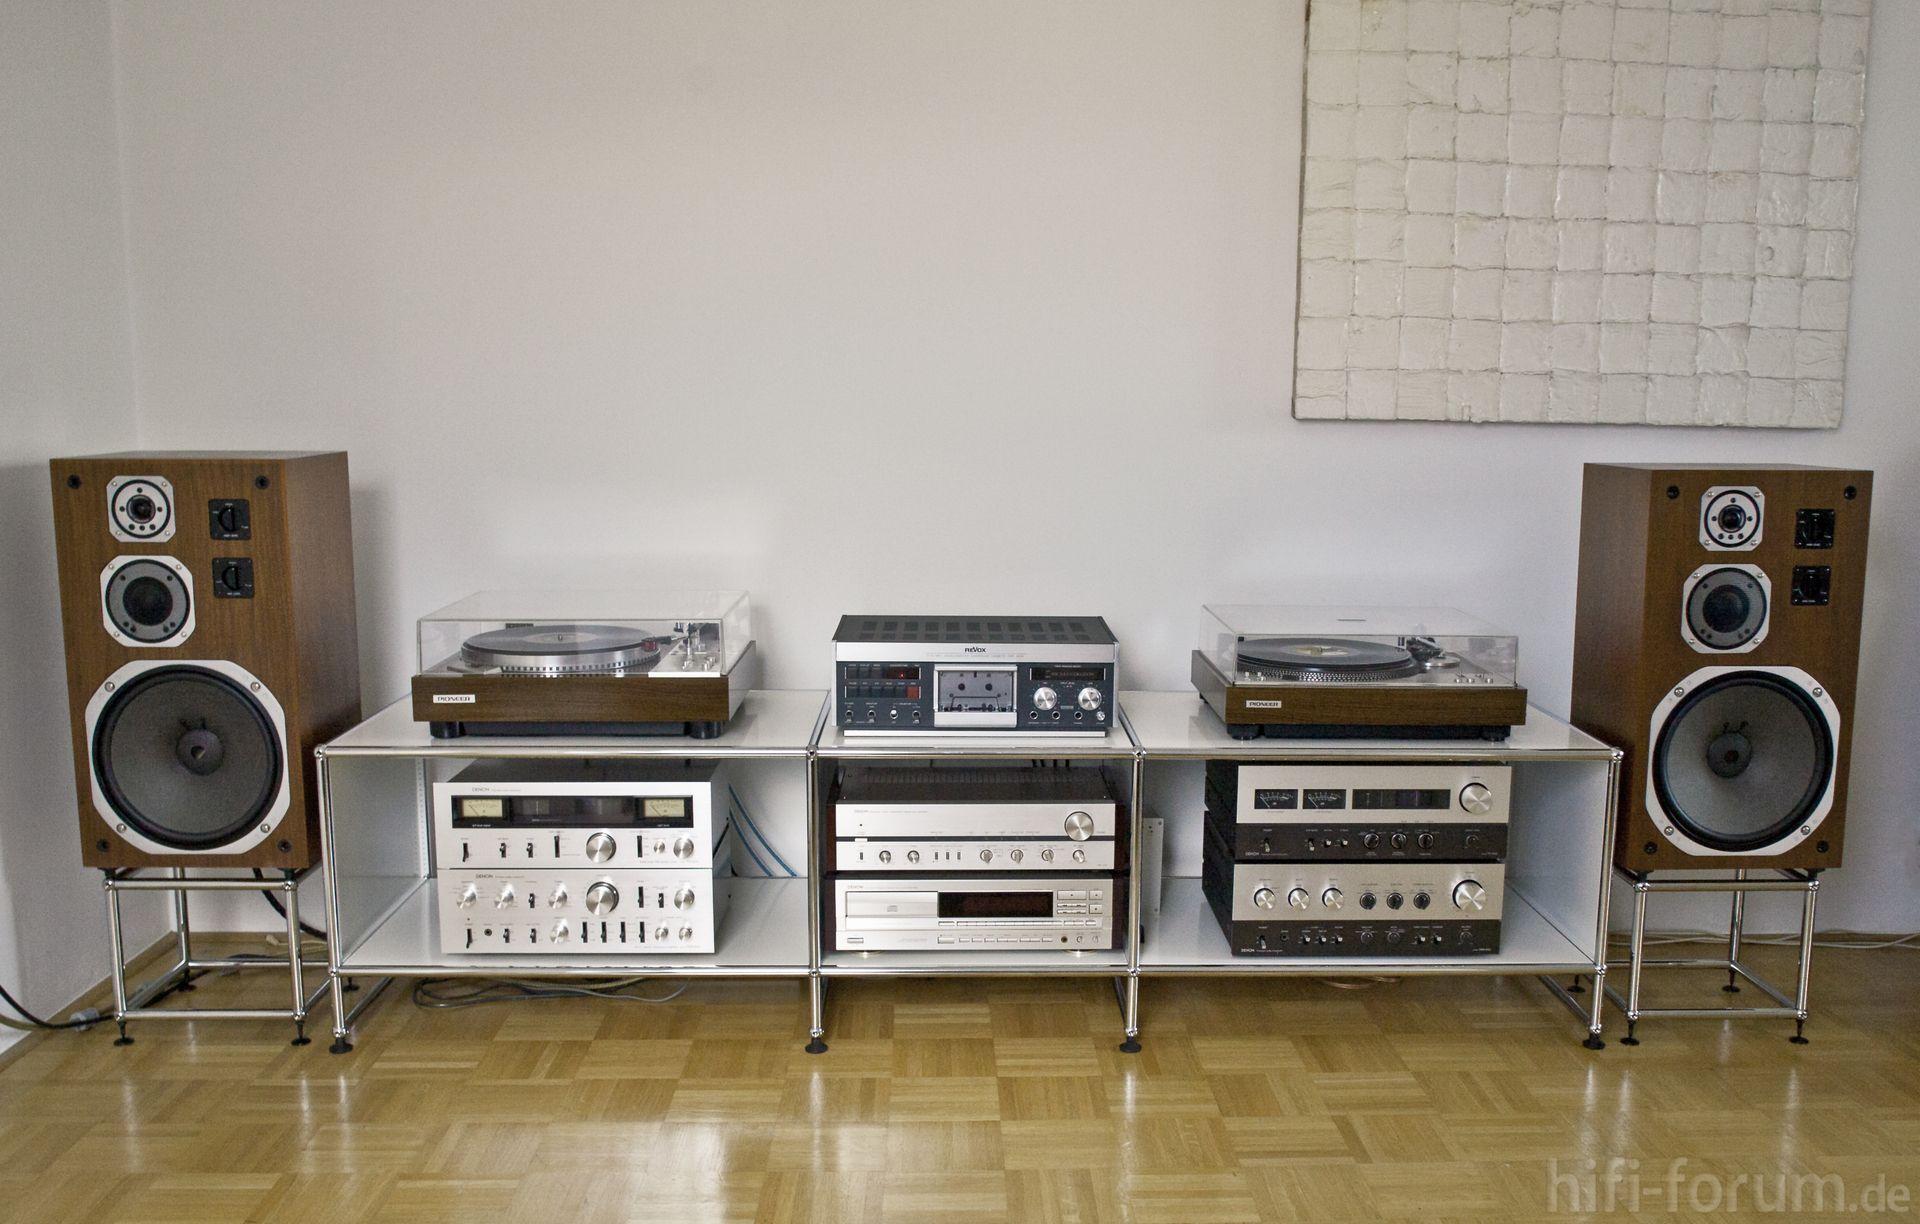 PL-530 | hifi-forum de | Stereo beauty in 2019 | Audio design